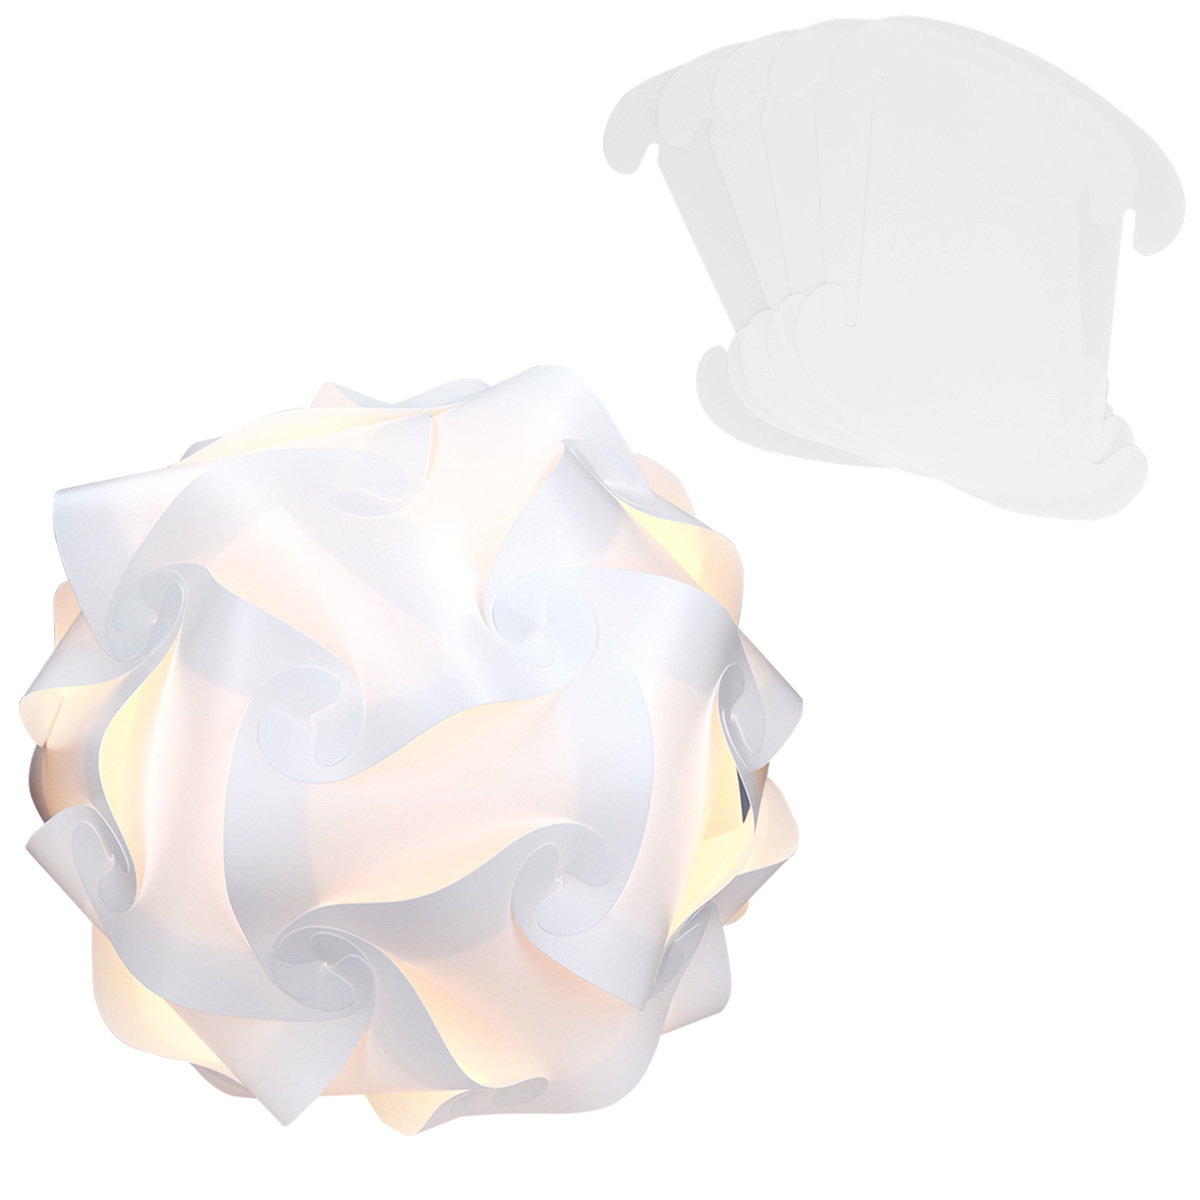 diy puzzle lampe lampenschirm schirm min 15 designs ca 40 cm gr xl in wei ebay. Black Bedroom Furniture Sets. Home Design Ideas